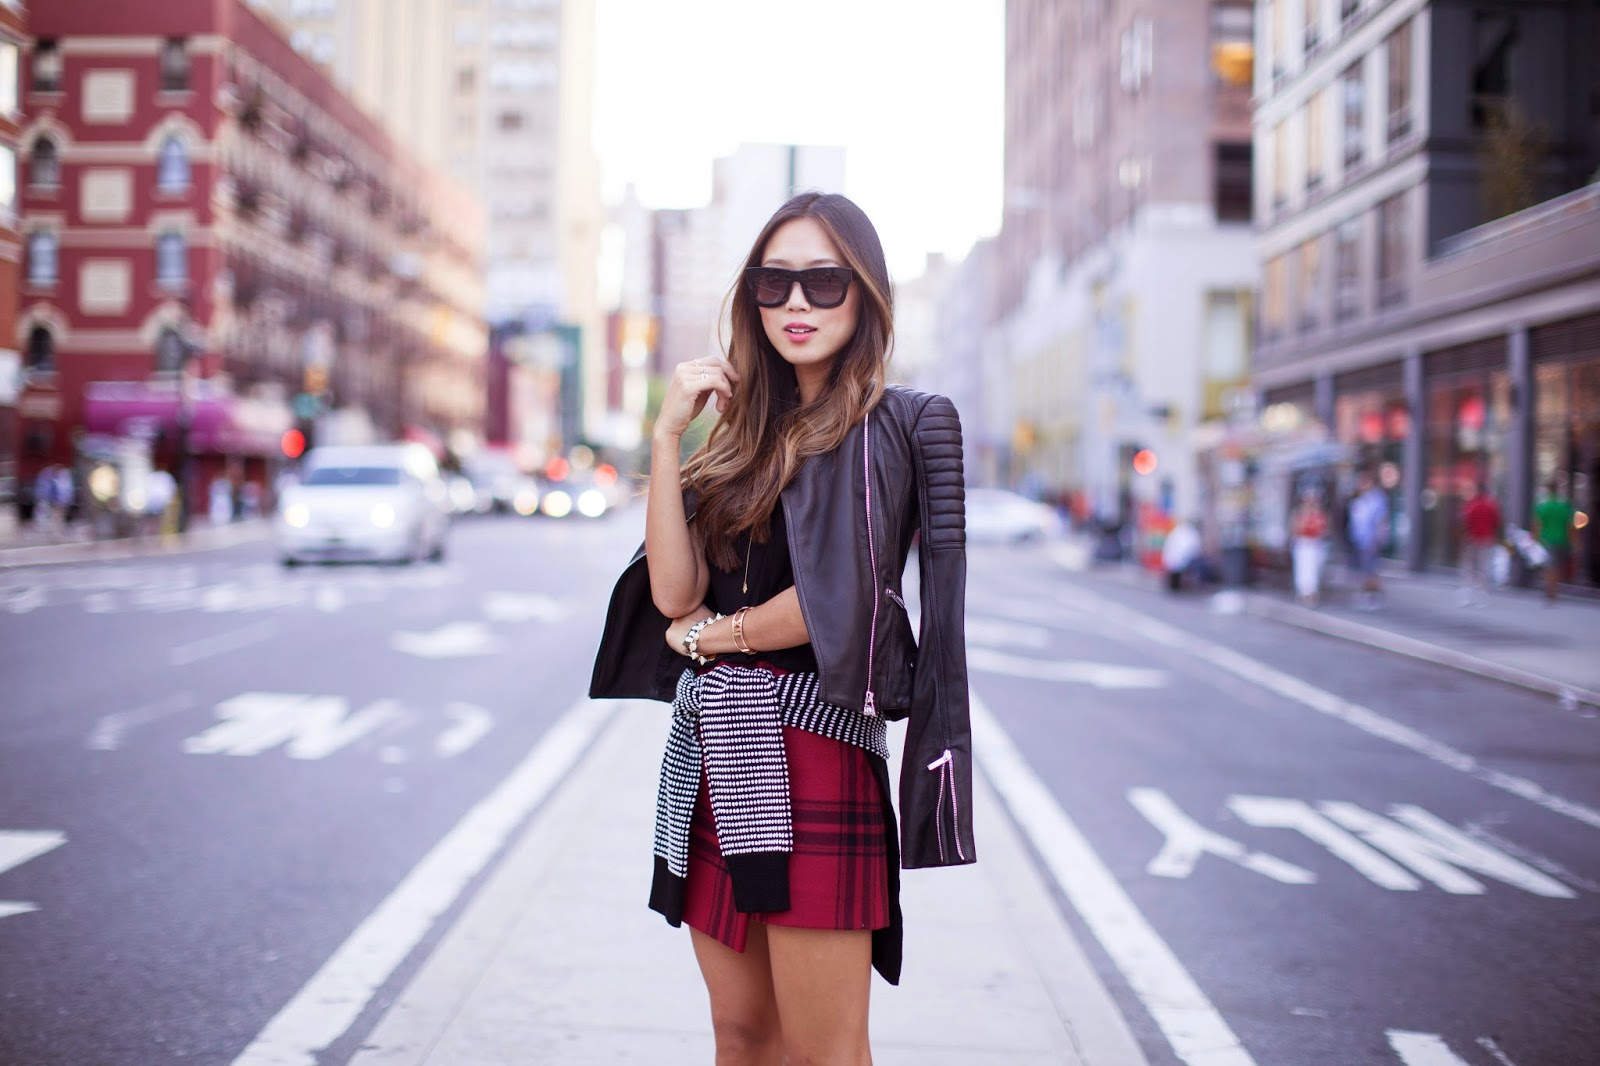 College girl fashion blog 4